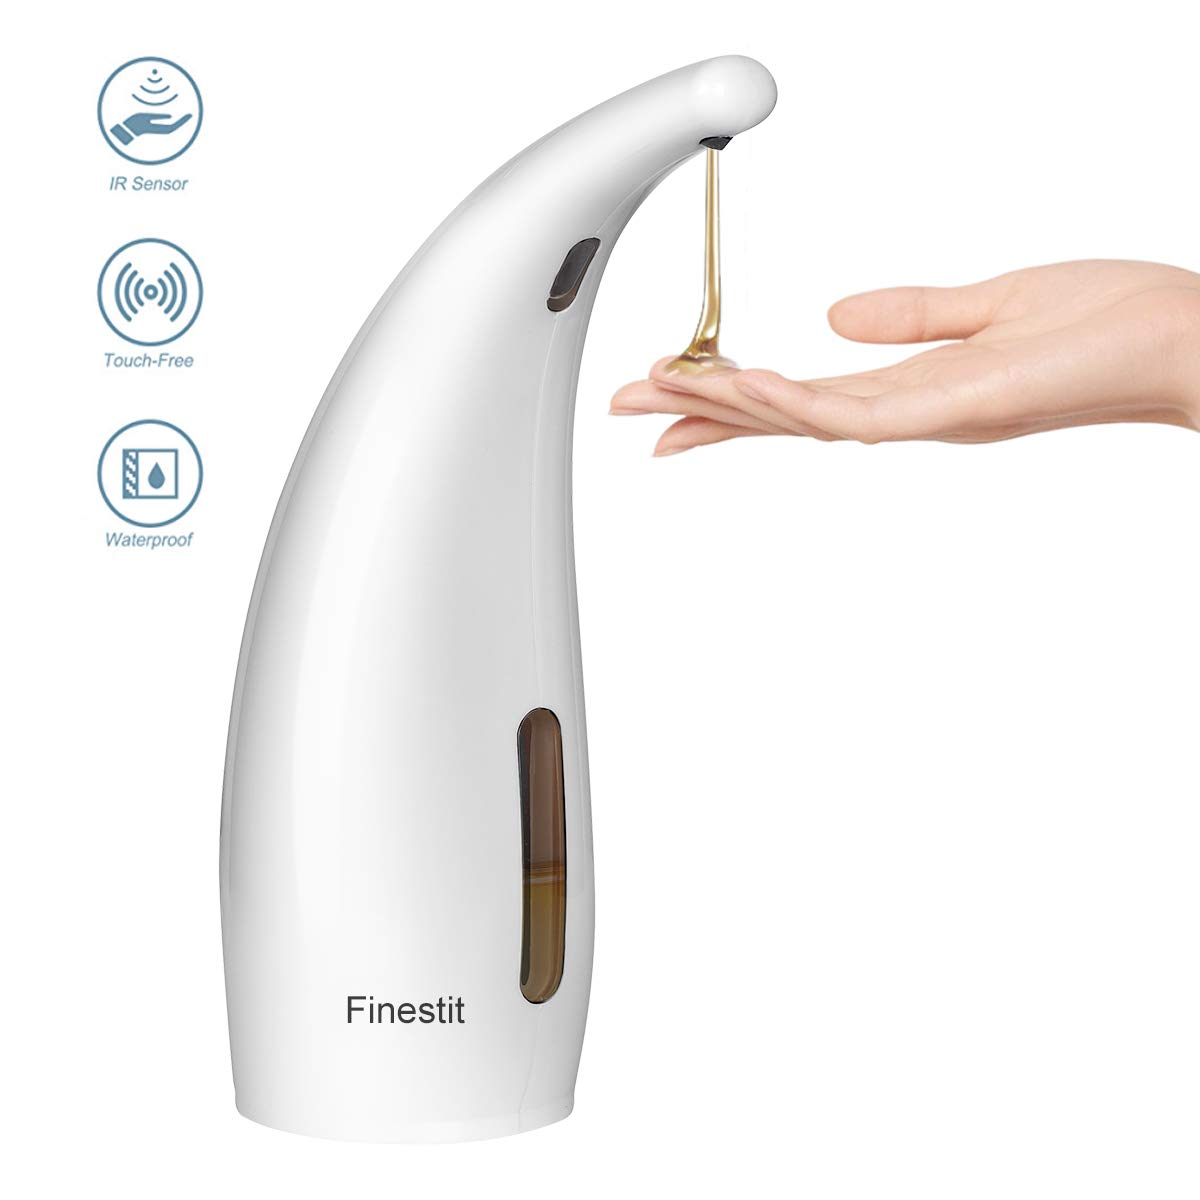 Finestit Soap Dispenser, Automatic Soap Dispenser,Electric Dish Soap Dispenser Suitable for Bathroom Kitchen Hotel Restaurant (White, 300ML)